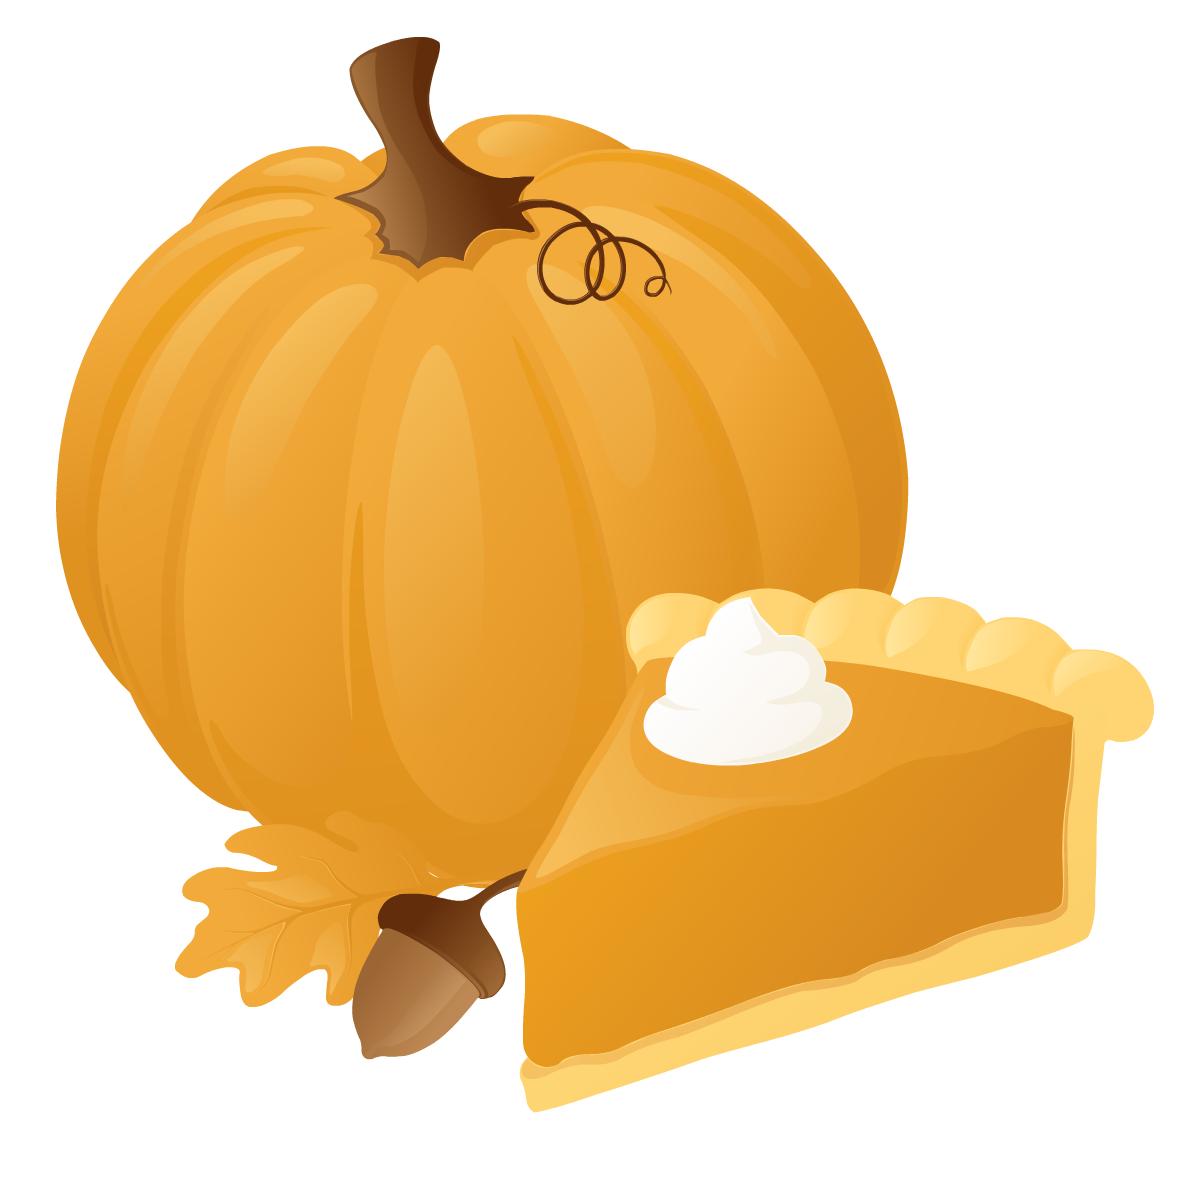 Free cliparts download clip. Desserts clipart pumpkin pie